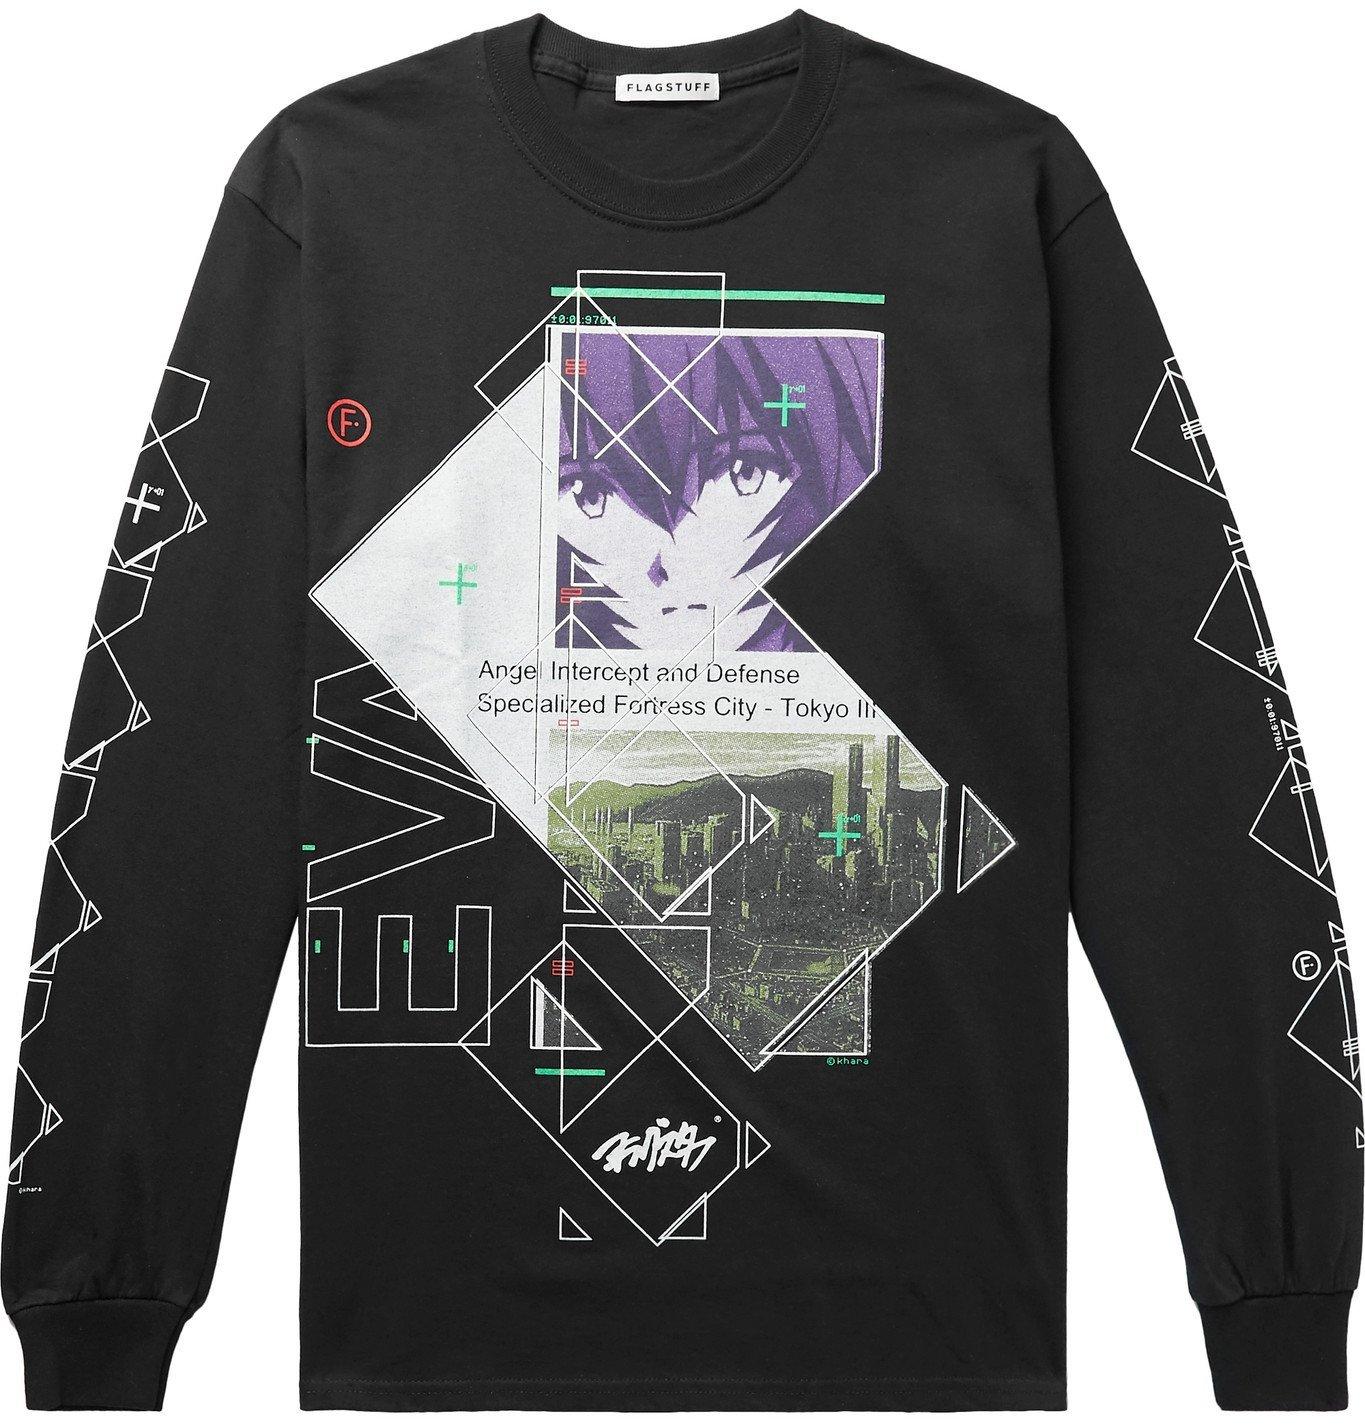 Photo: Flagstuff - Evangelion Printed Cotton-Jersey T-Shirt - Multi